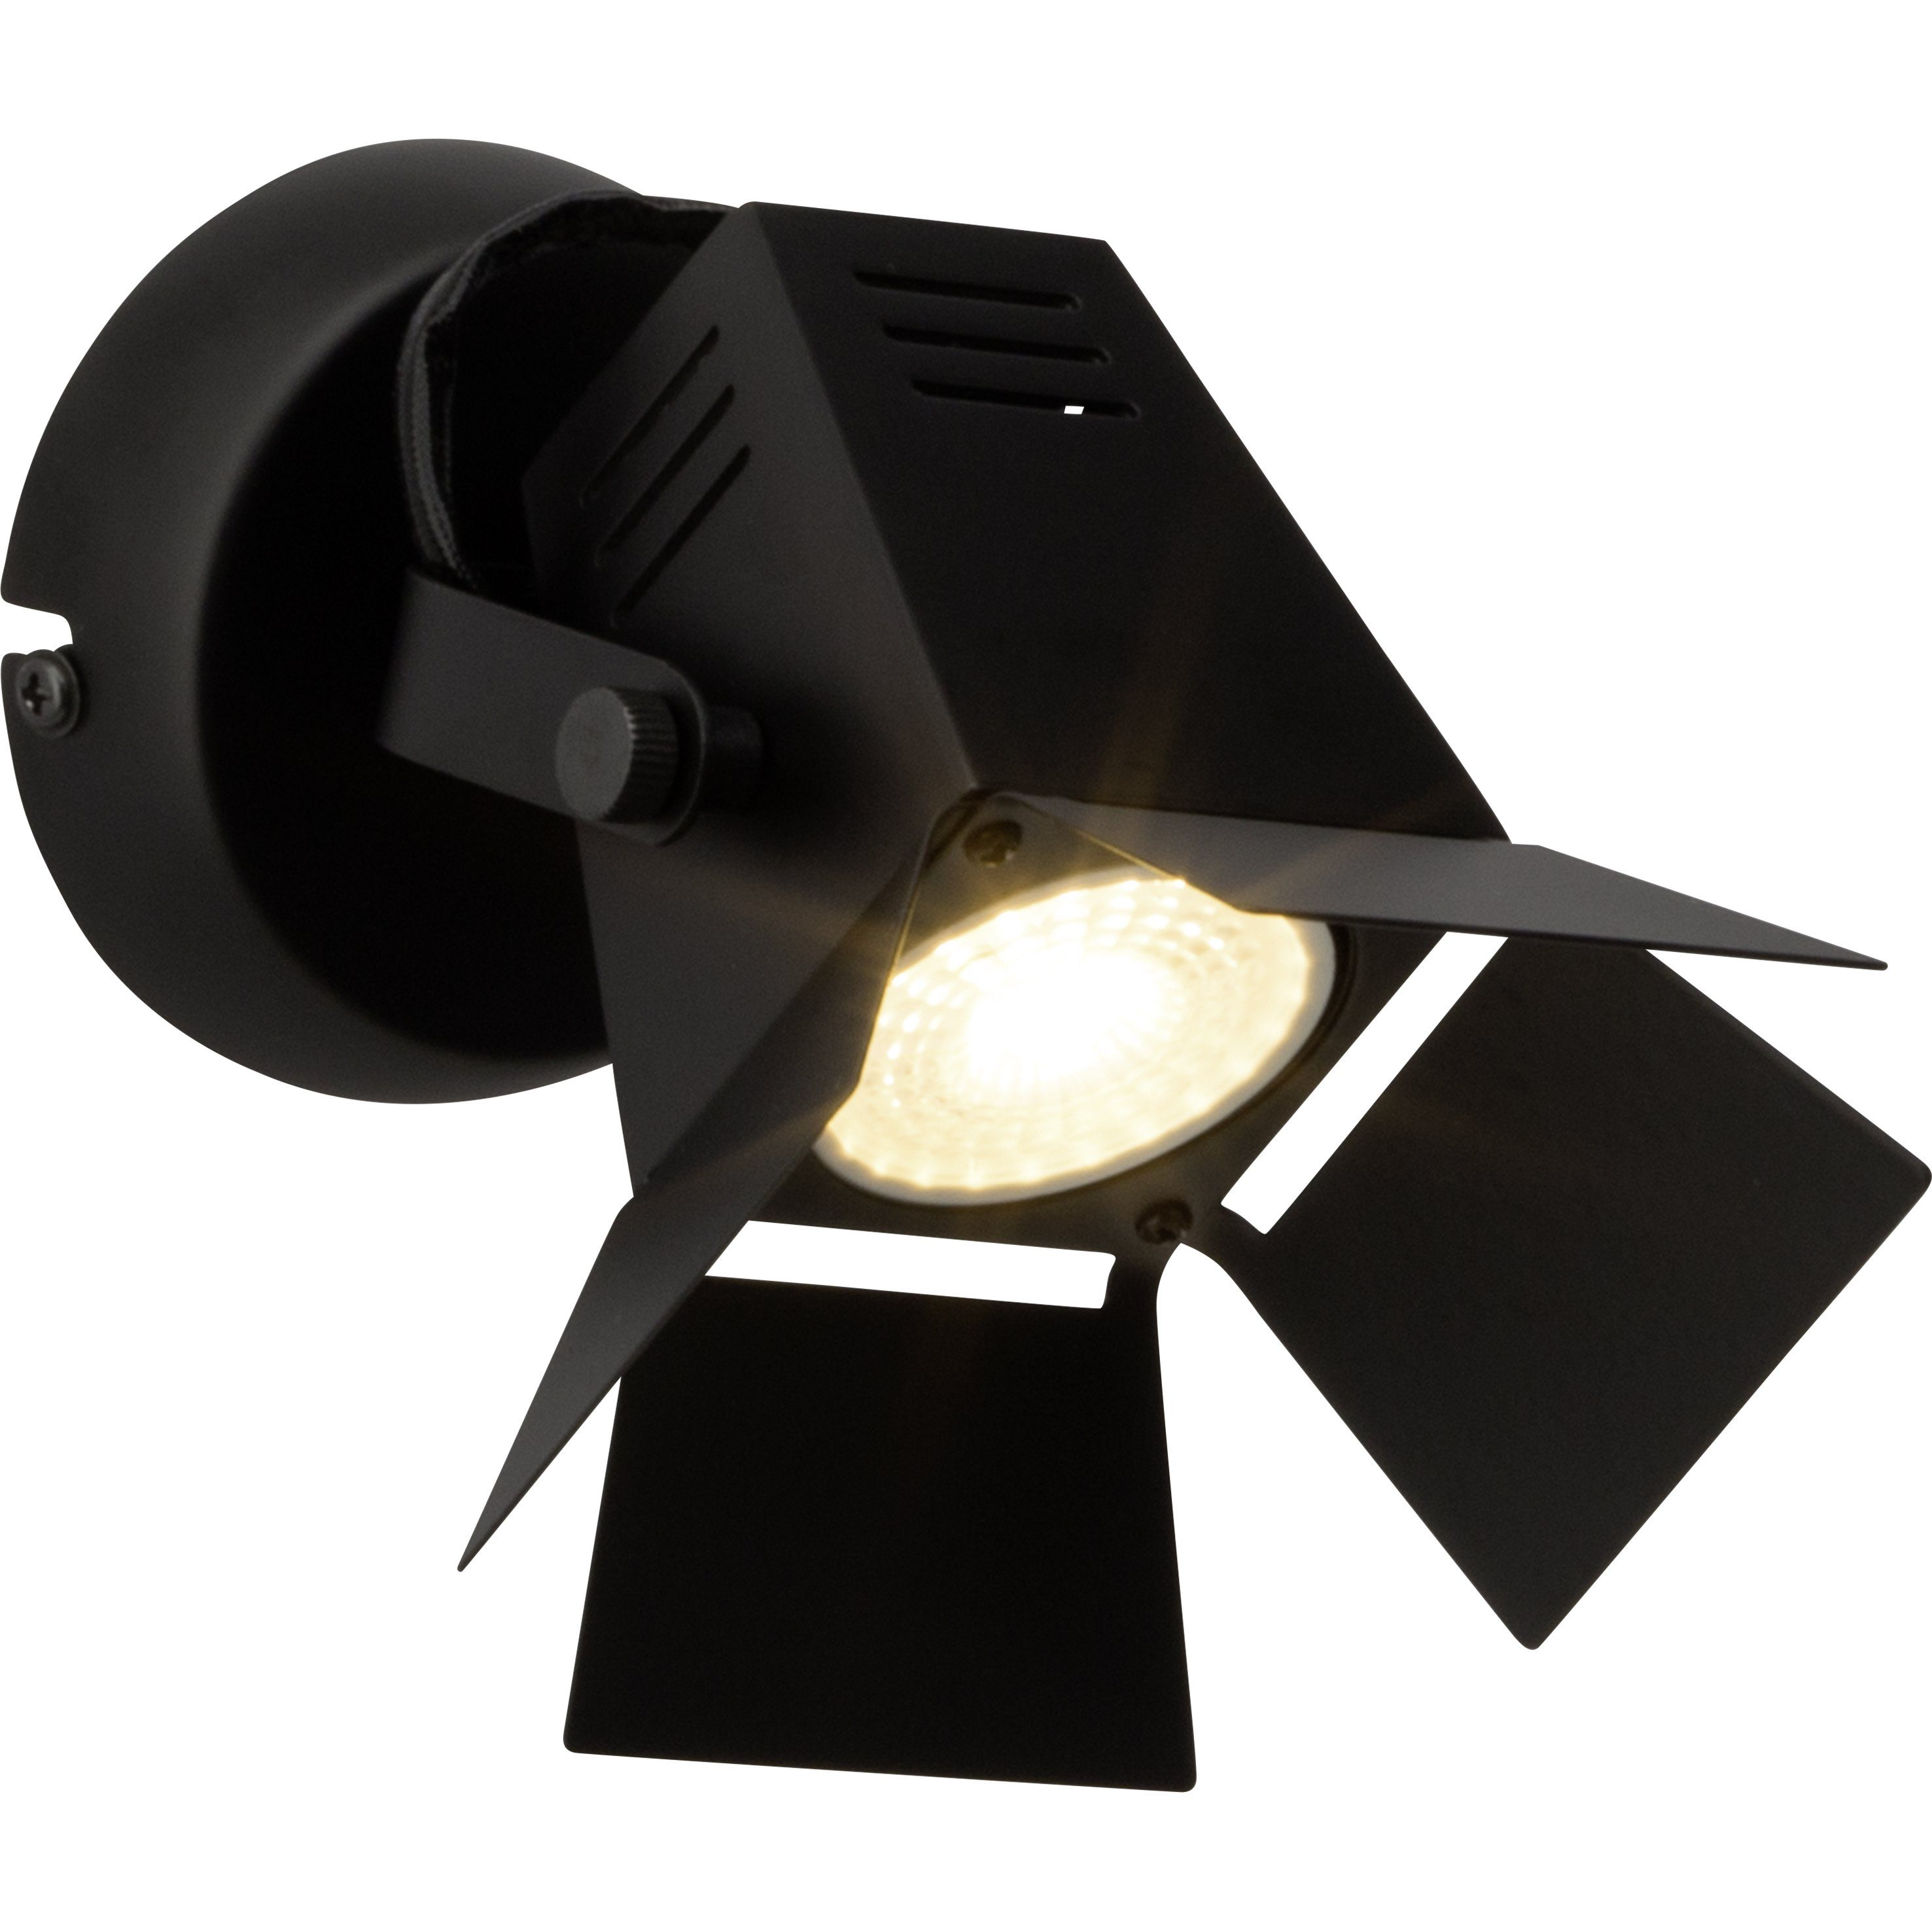 Brilliant Leuchten Movie LED Wandspot schwarz matt